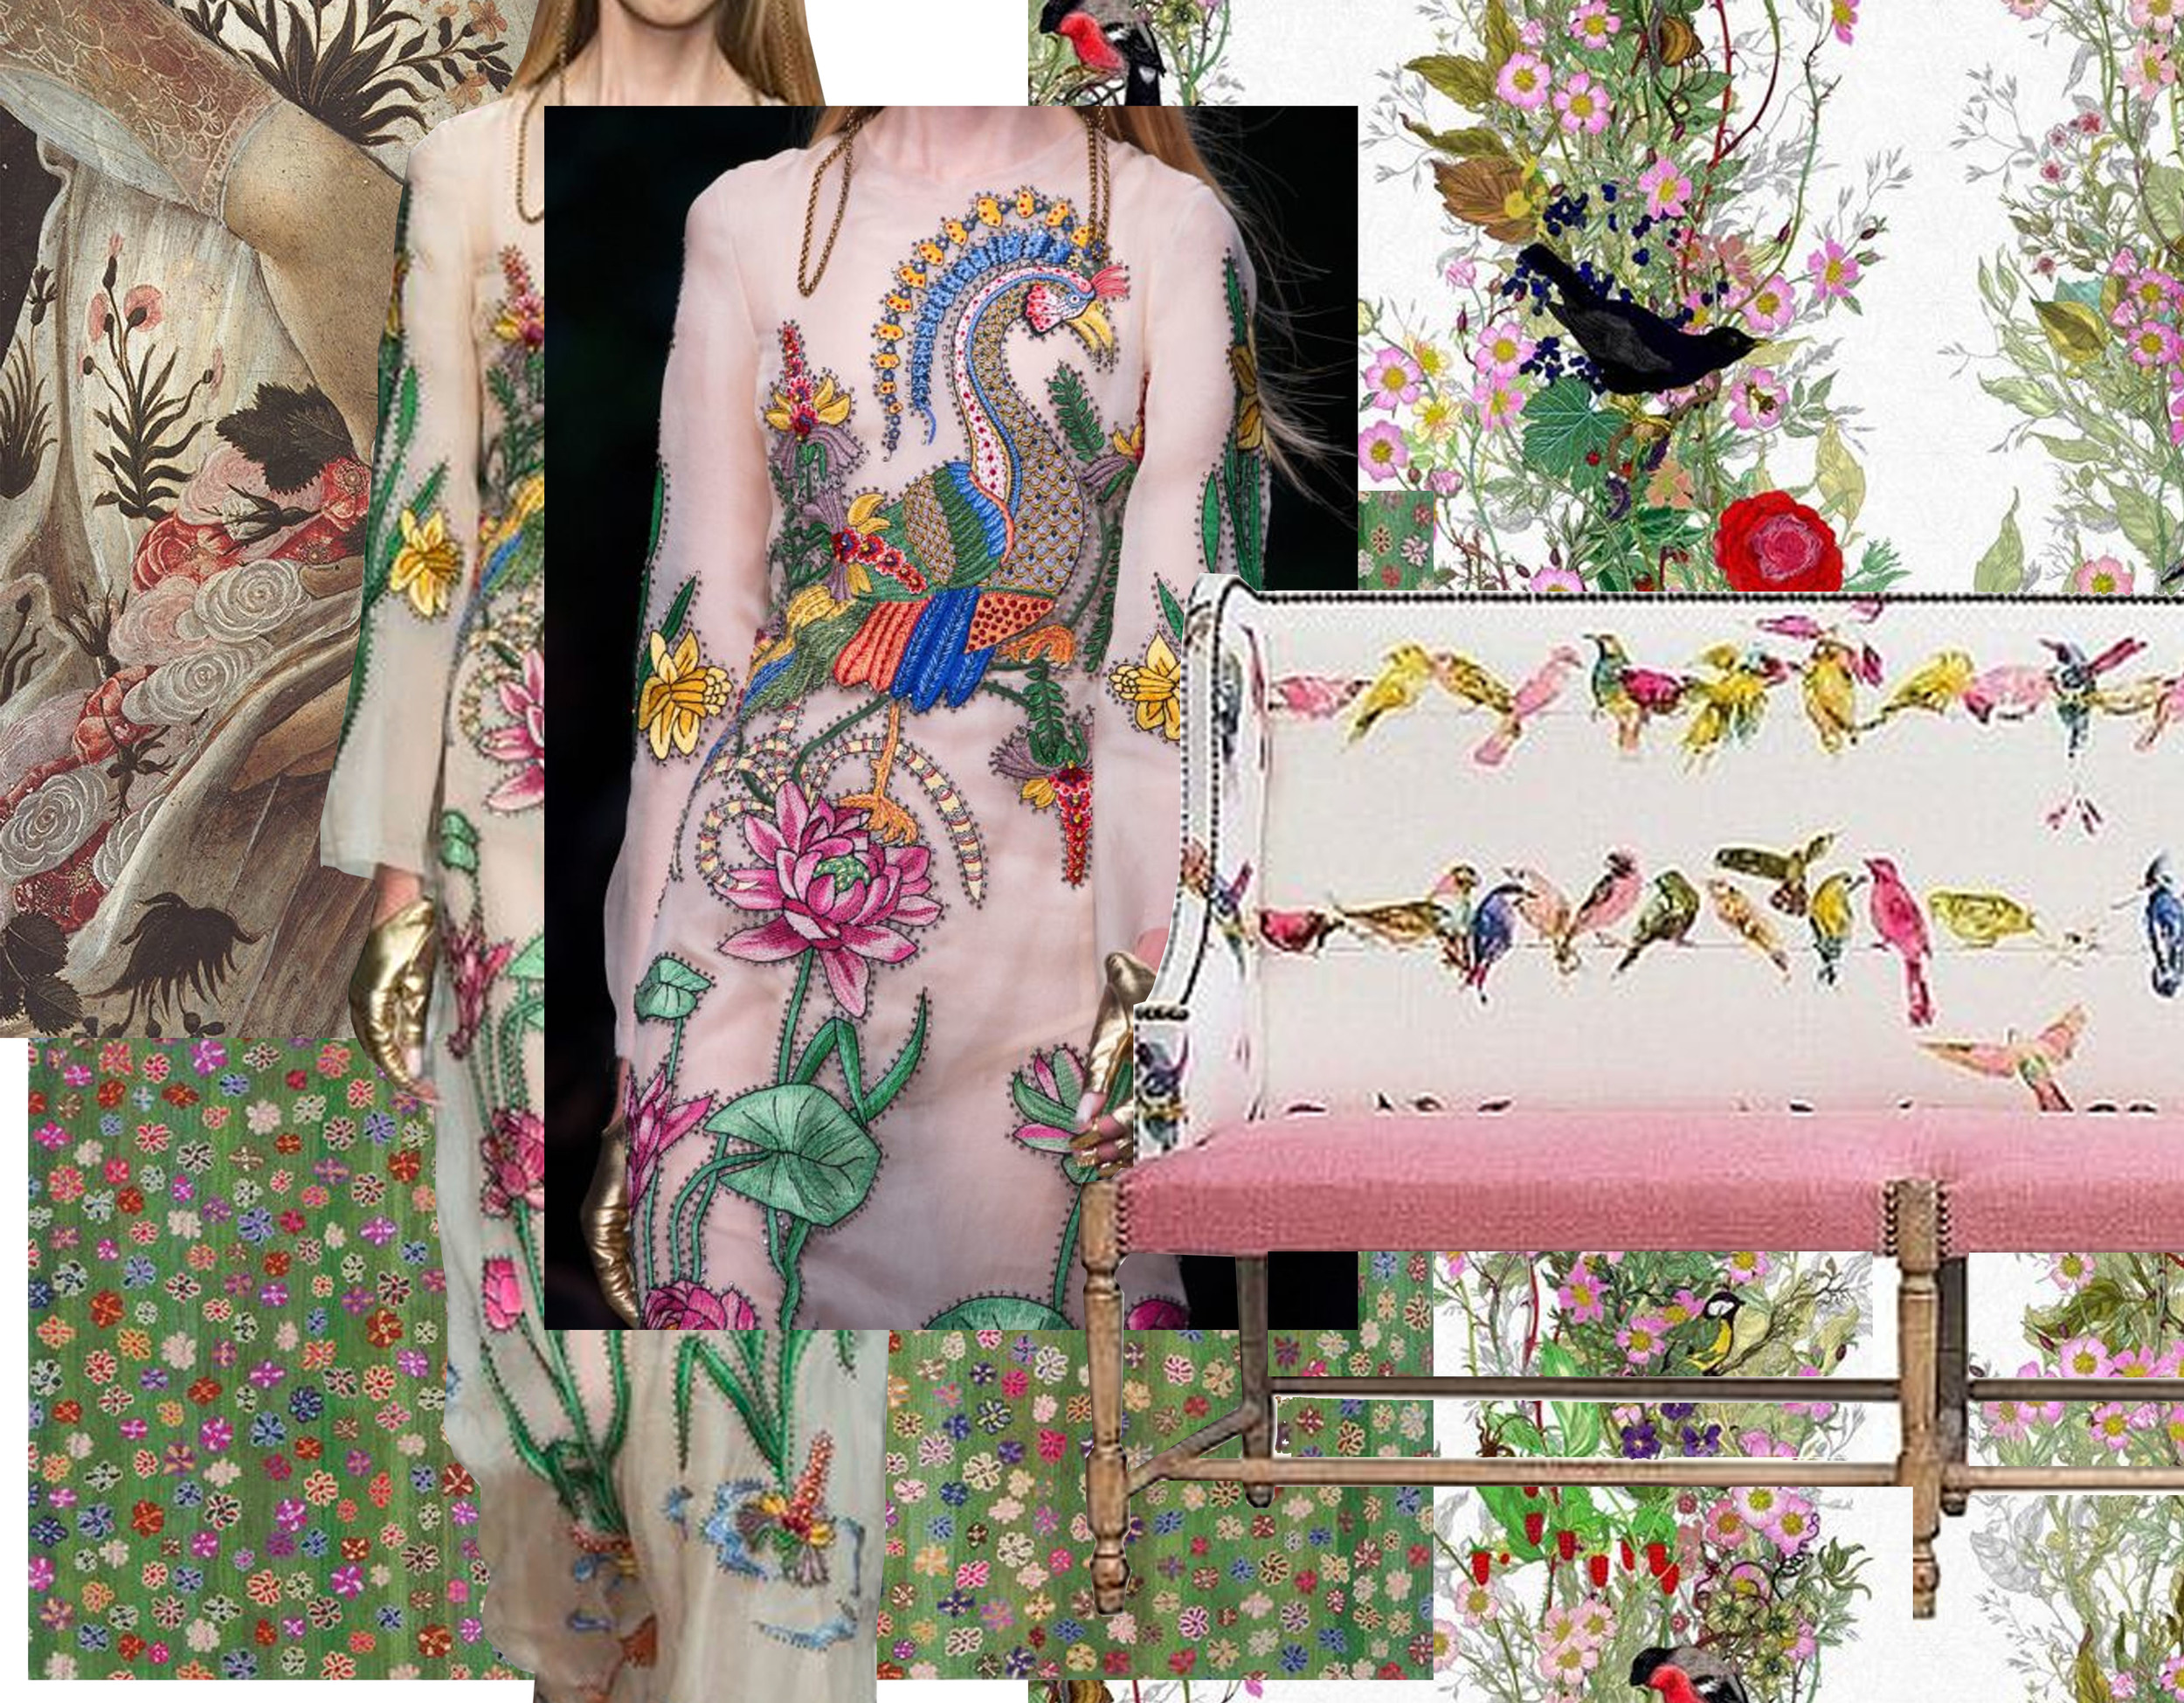 detail painting Primavera  Botticelli  -  Gucci  summer 2016 - rug Little Flowers  Jan Kath  - wallpaper Fruit Looters  Timorous Beasties  - banquette  Moissonnier